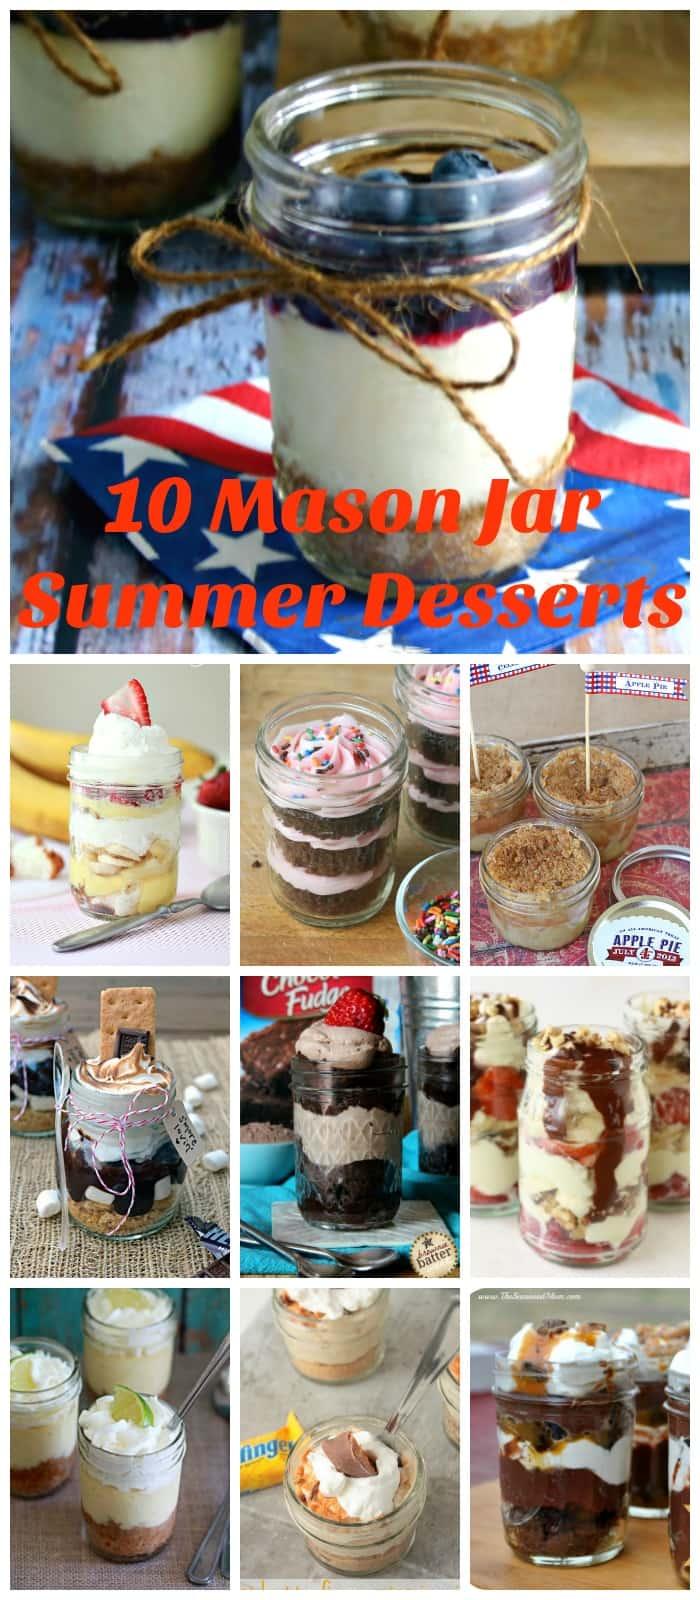 10 Mason Jar Summer Desserts | Life, Love, and Good Food